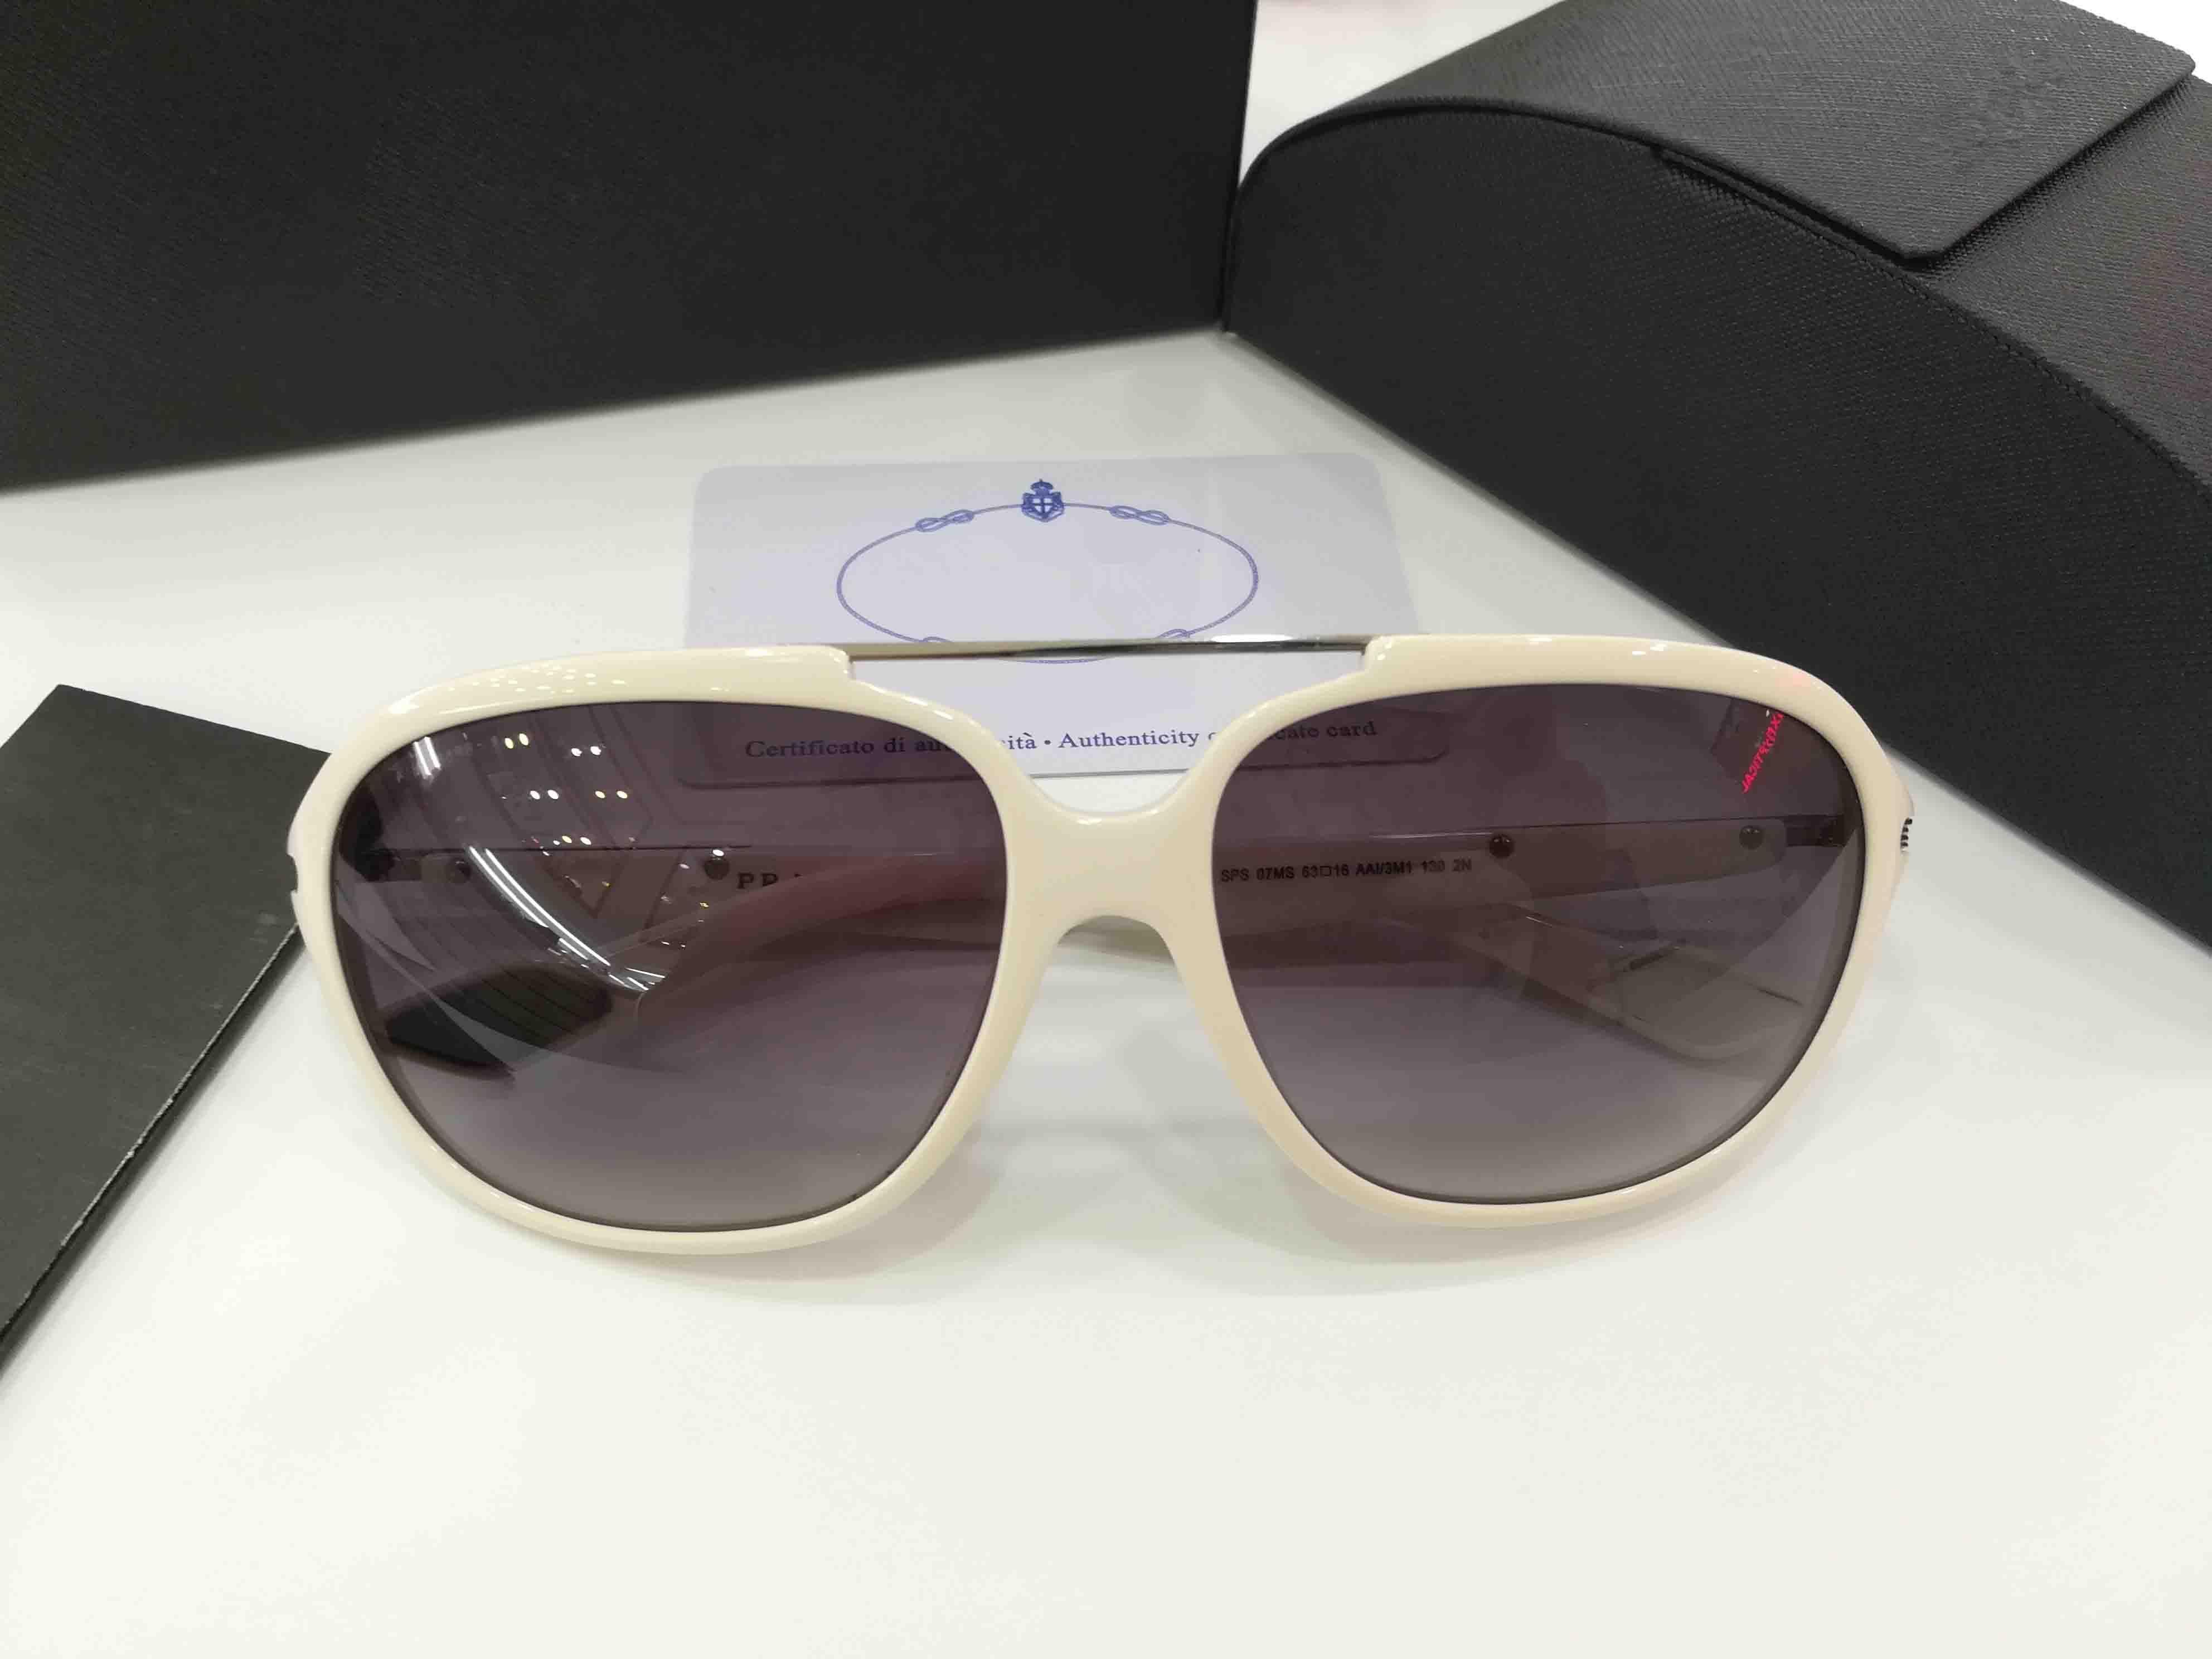 b236f5e16671 SPS07MS Fashion Eyeglasses Brand Designer Men Sunglasses UV400 ...